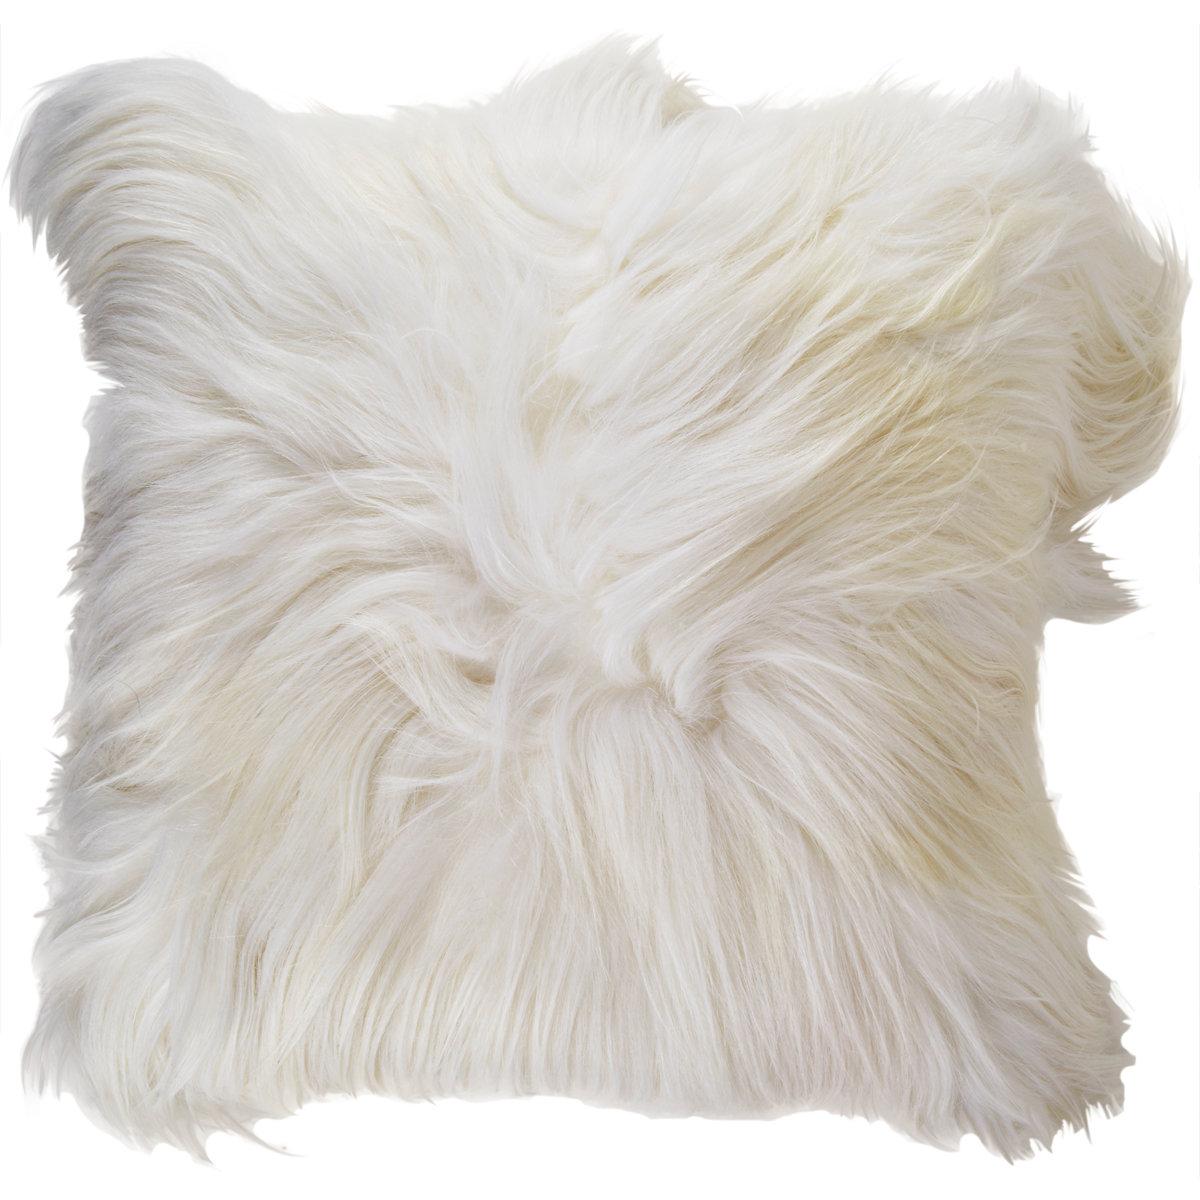 ADRIENNE LANDAU Lamb Fur Decorative Pillow $395